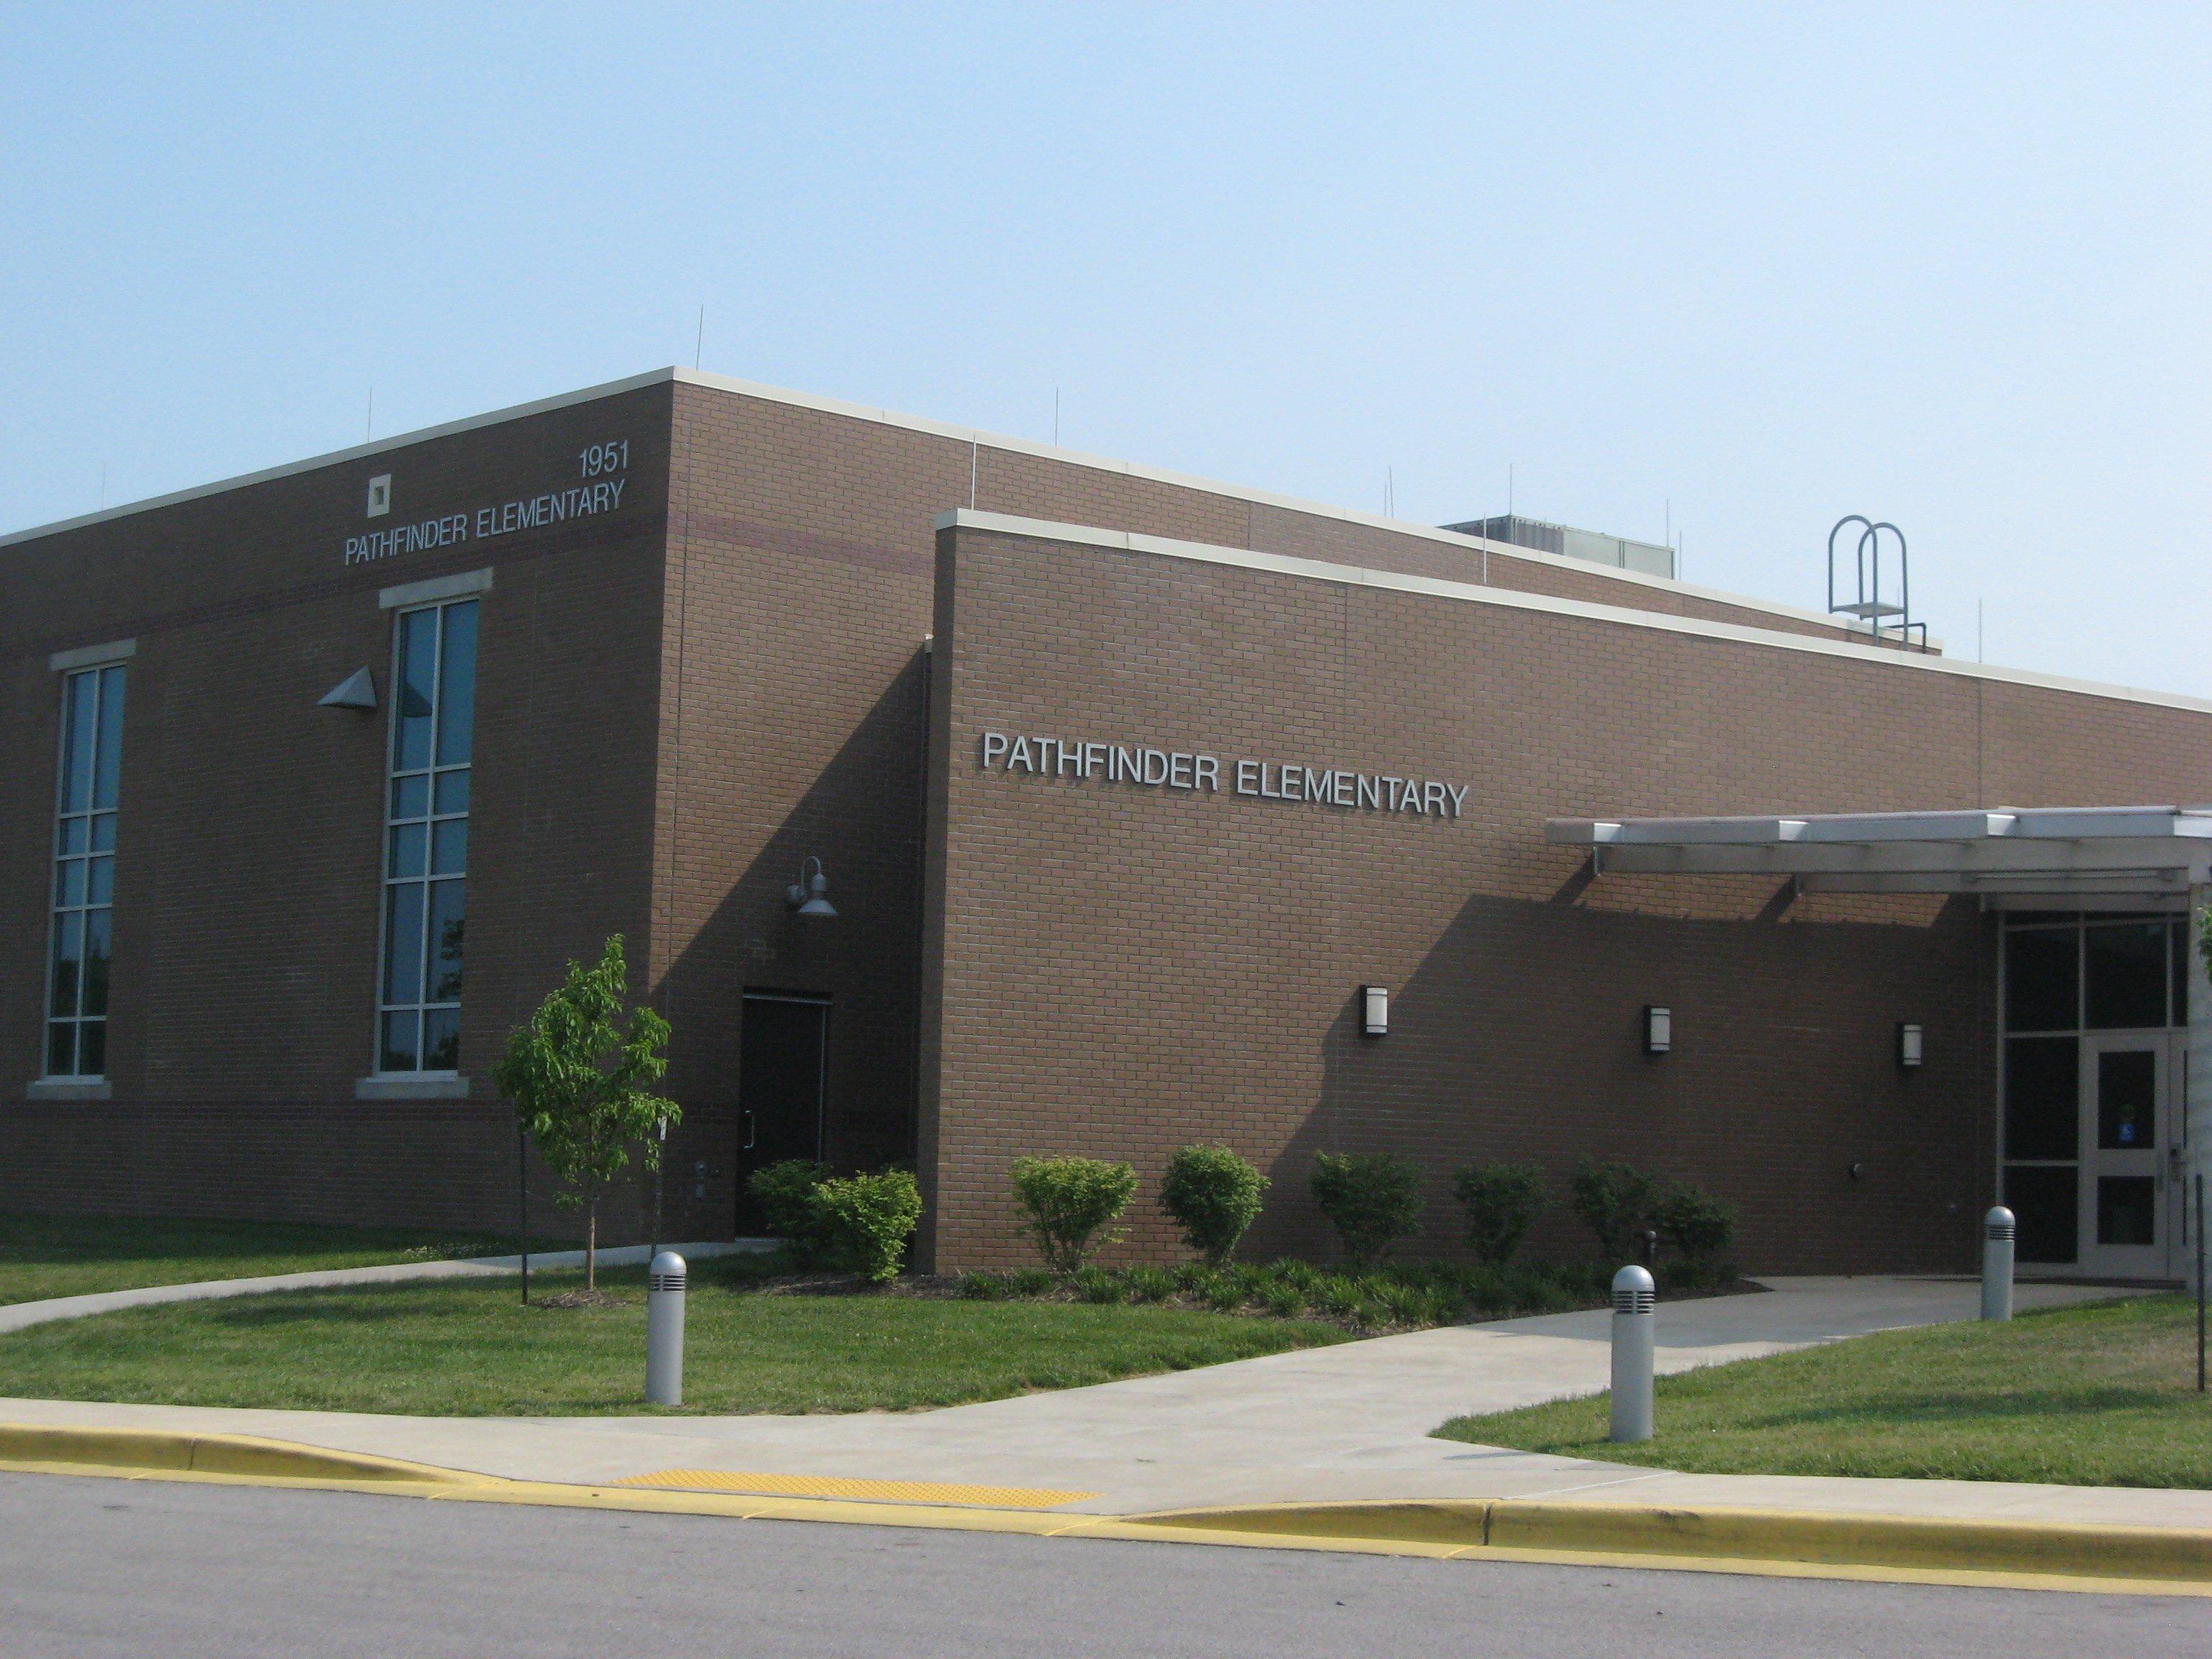 Pathfinder Elementary